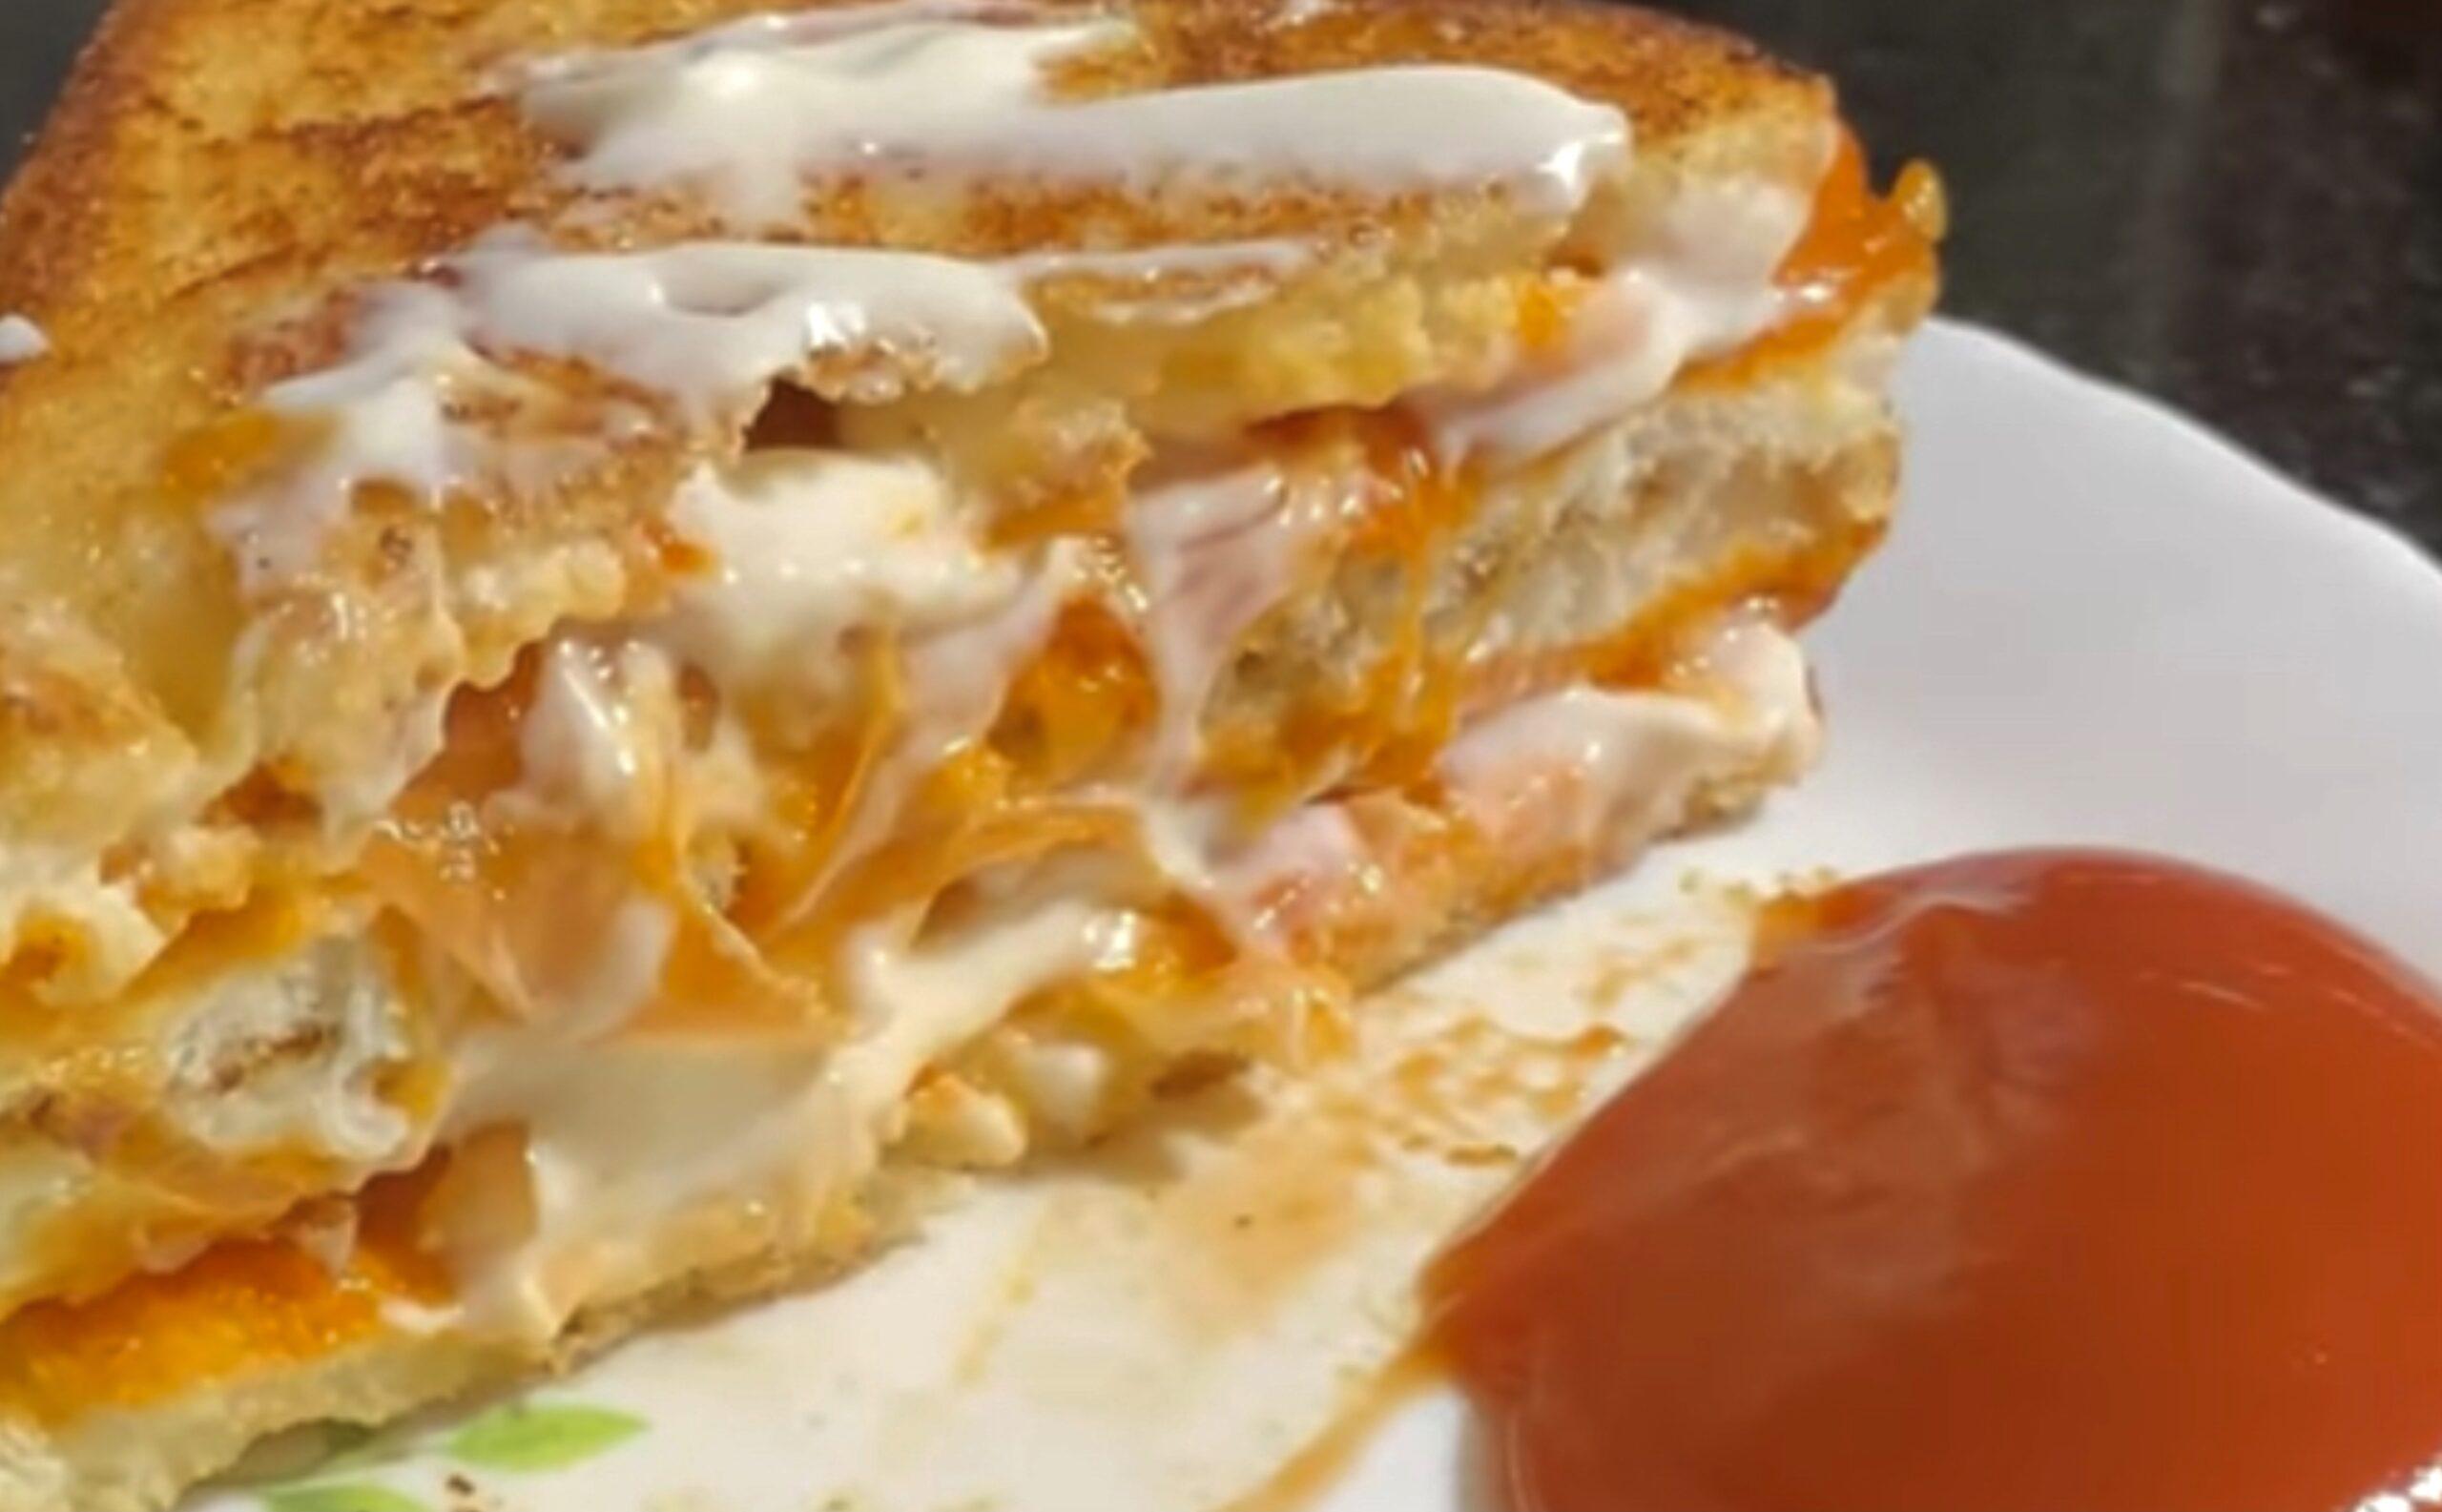 Sandwich-Crunchy-Onion-Tomato-Mayonnaise-Sandwich